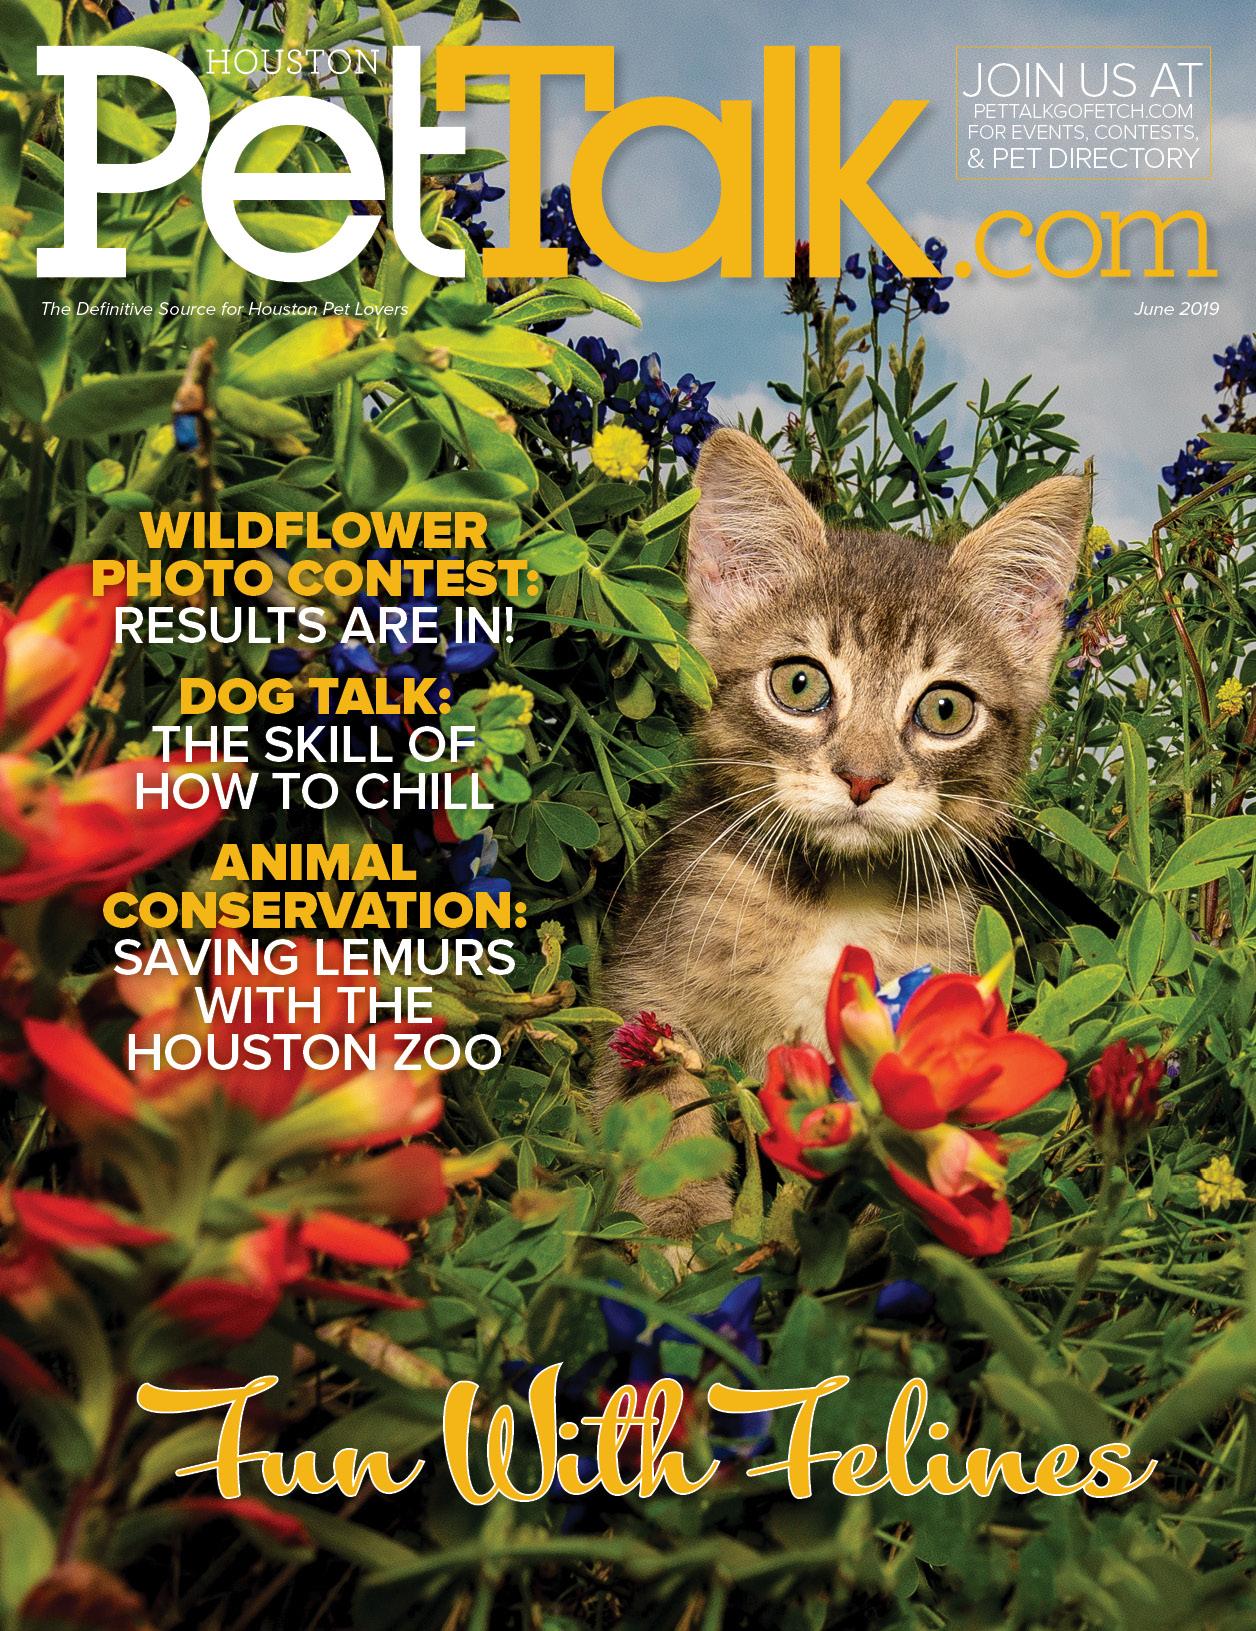 June 2019 Digital Issue of Houston PetTalk